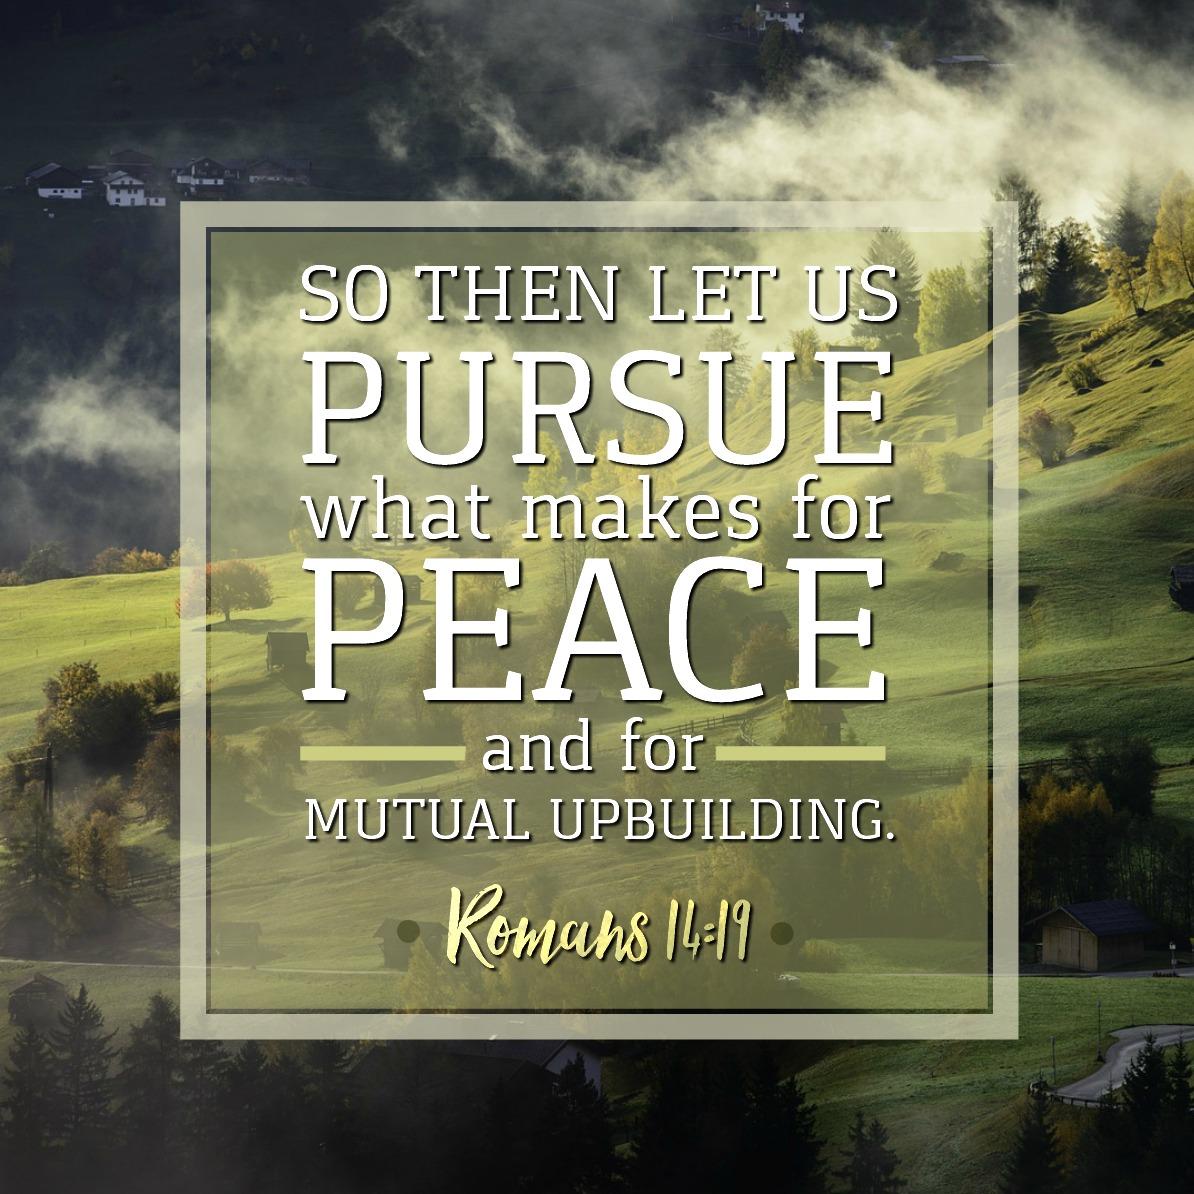 Romans 14:19